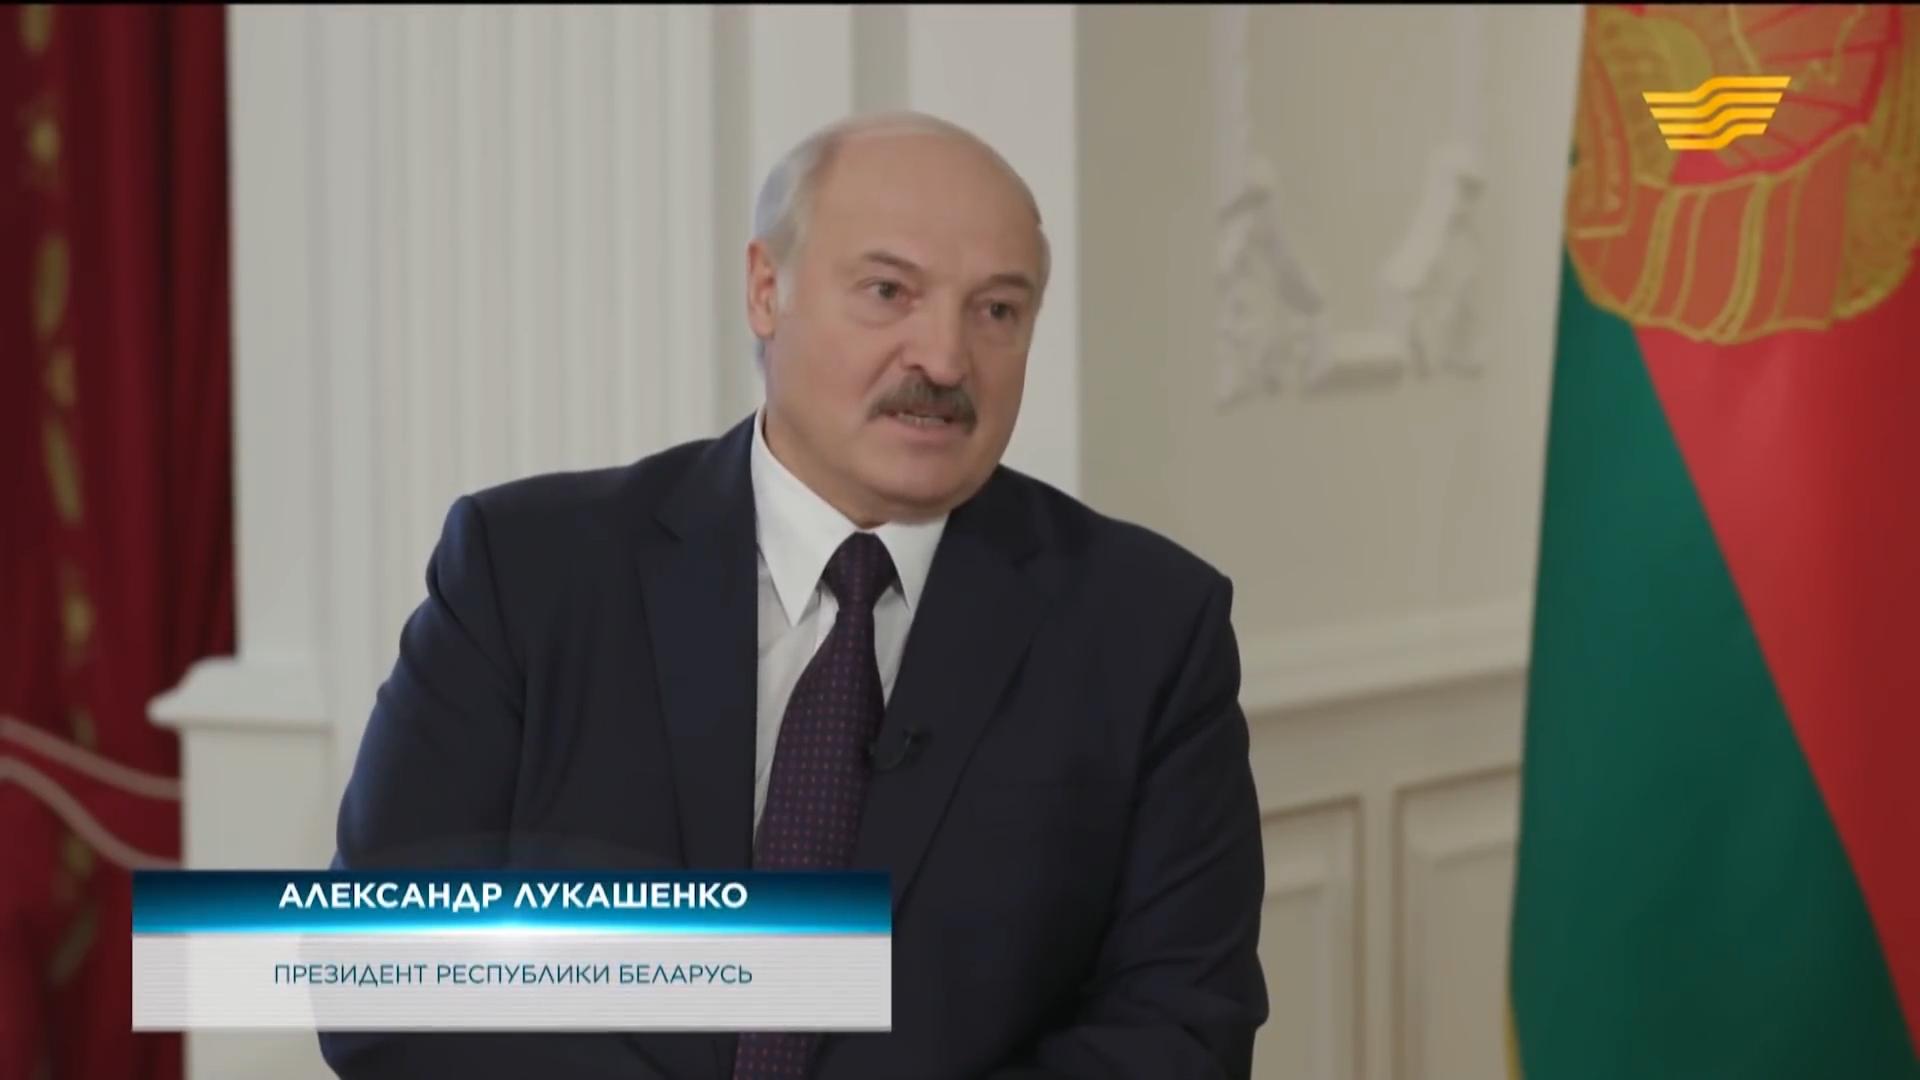 20191022_20-40-Александр Лукашенко дал эксклюзивное интервью телеканалу «Хабар»-scr10